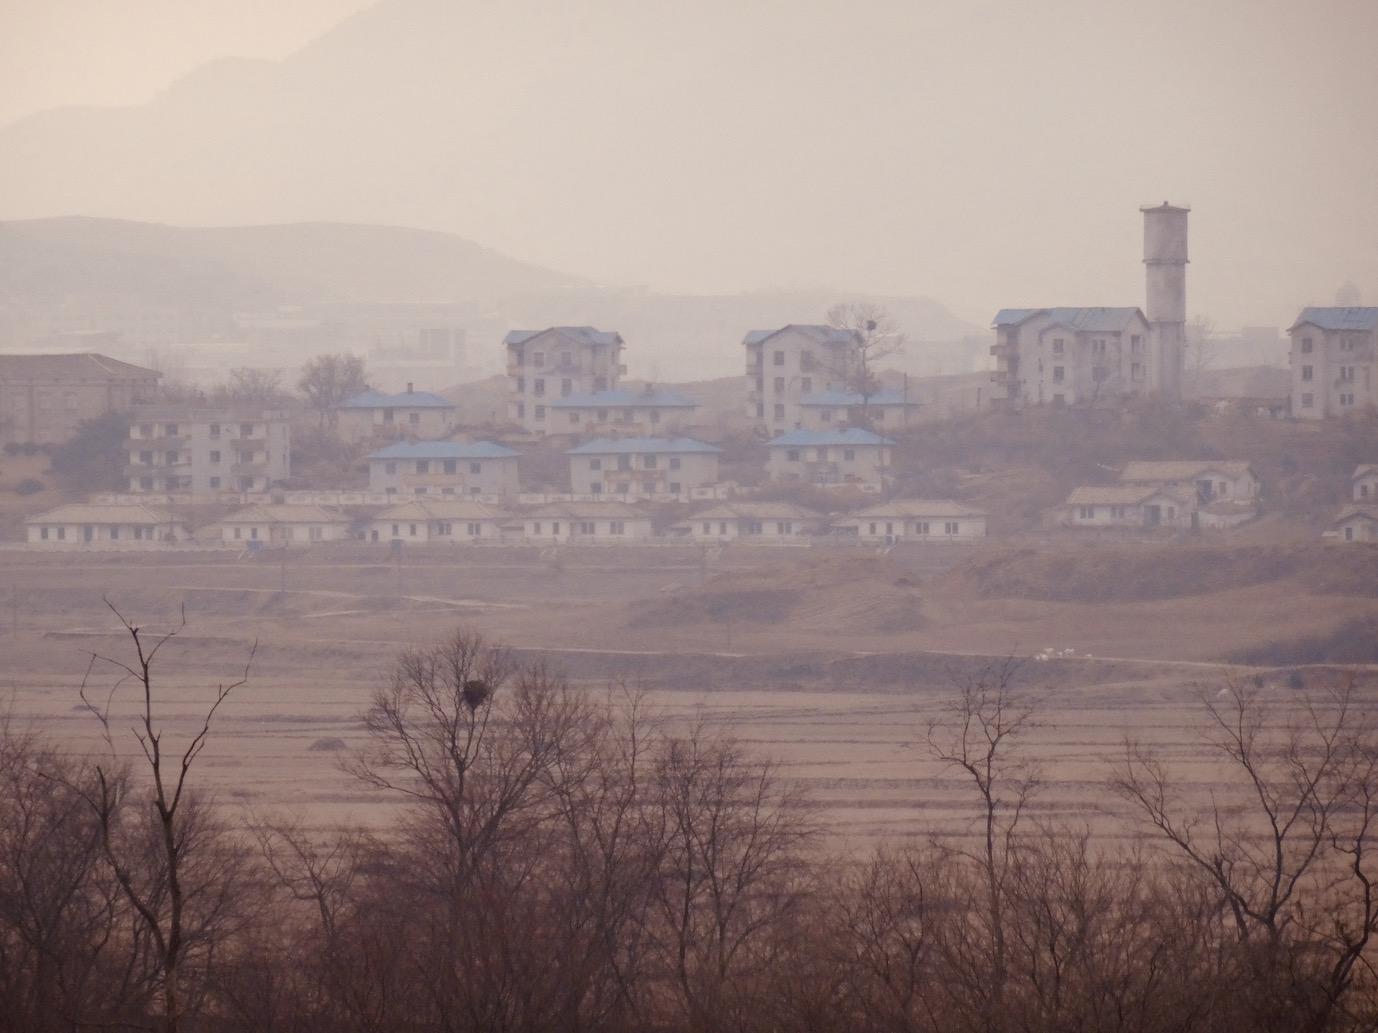 Kijong-dong Village in North Korea